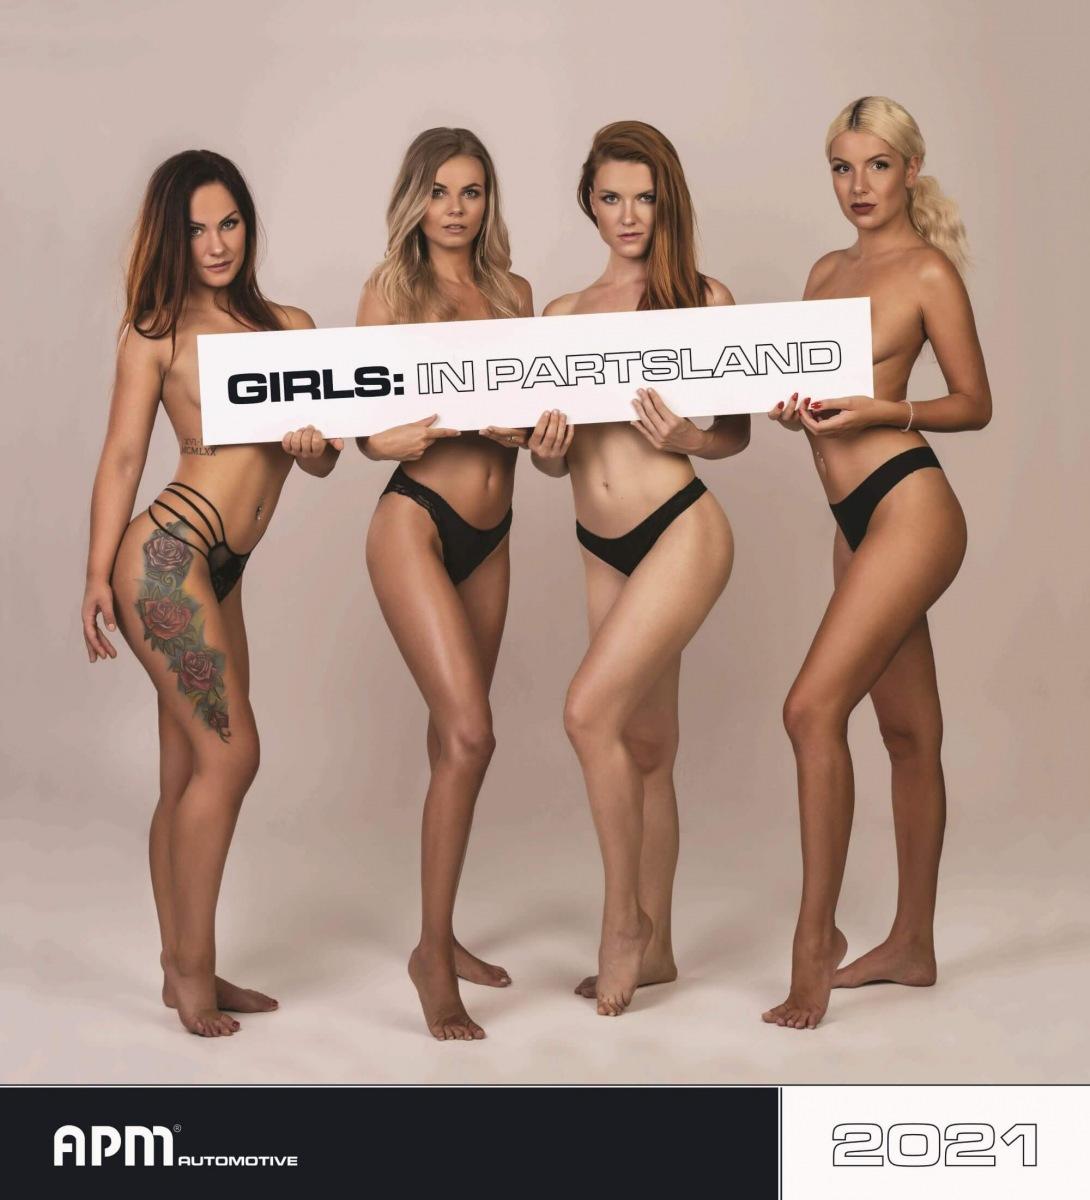 GIRLS: IN PARTSLAND kalendář APM Automotive